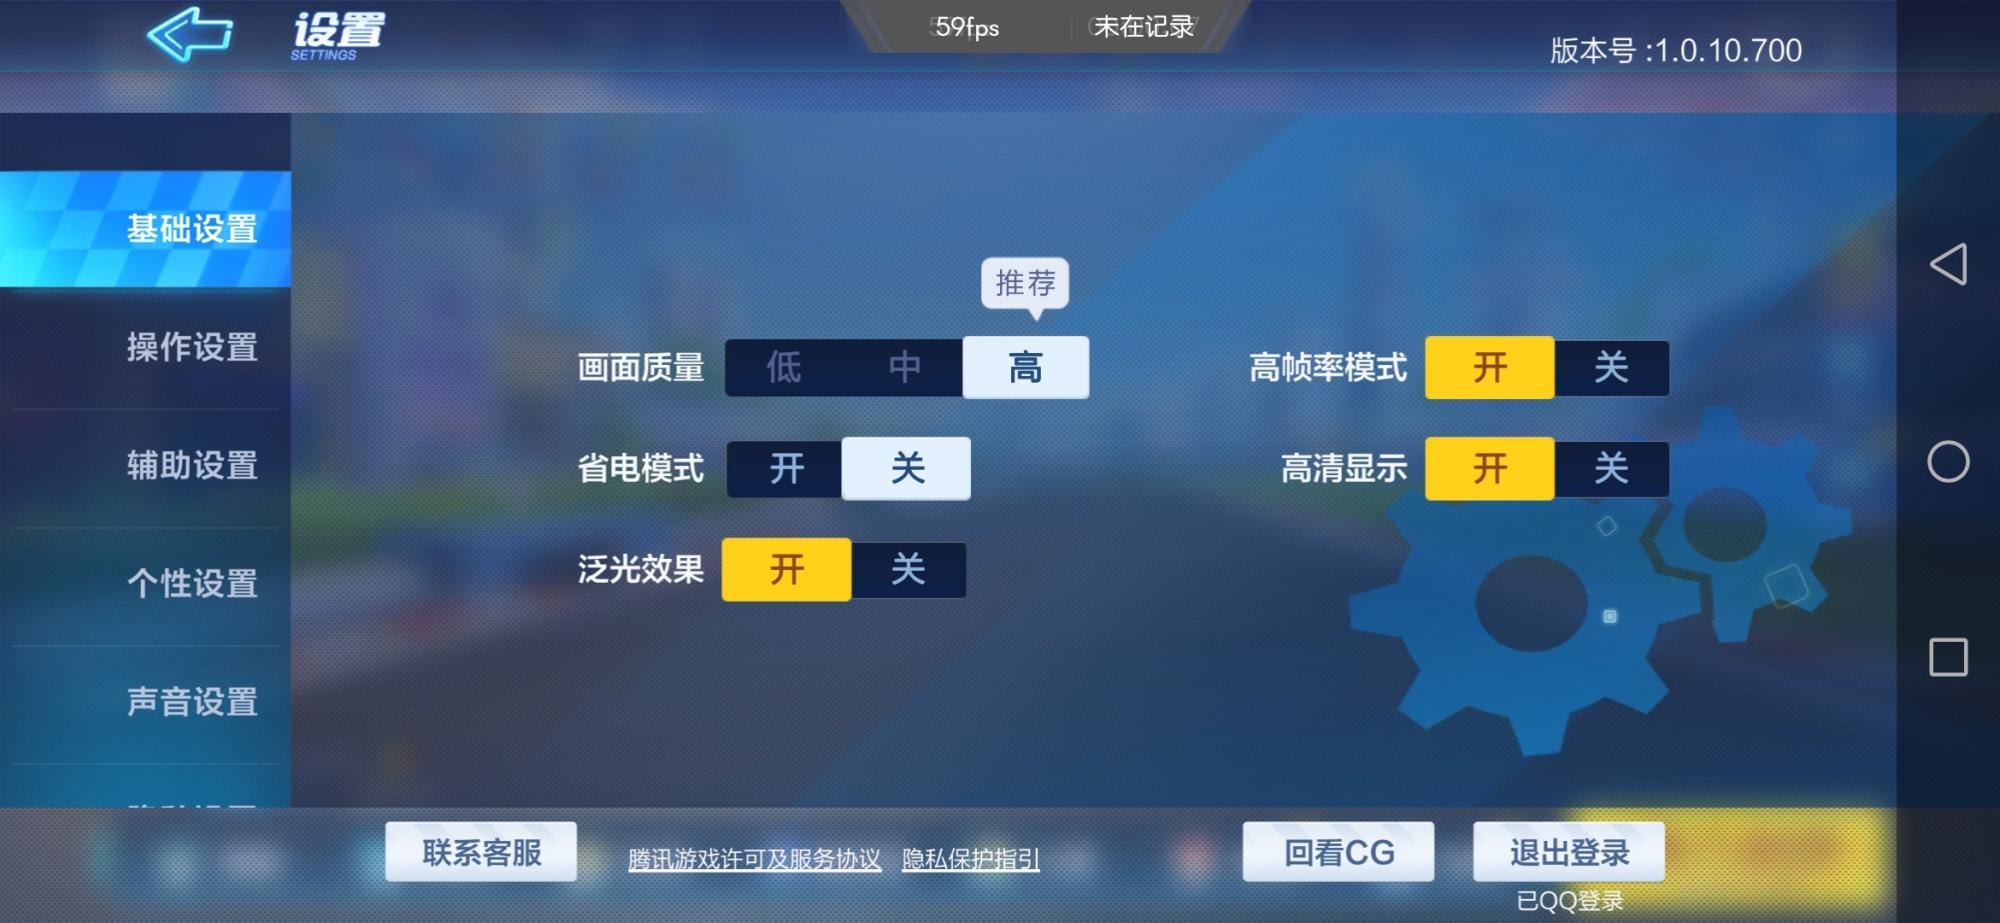 Screenshot_20190812_011917_com.tencent.tmgp.WePop.jpg